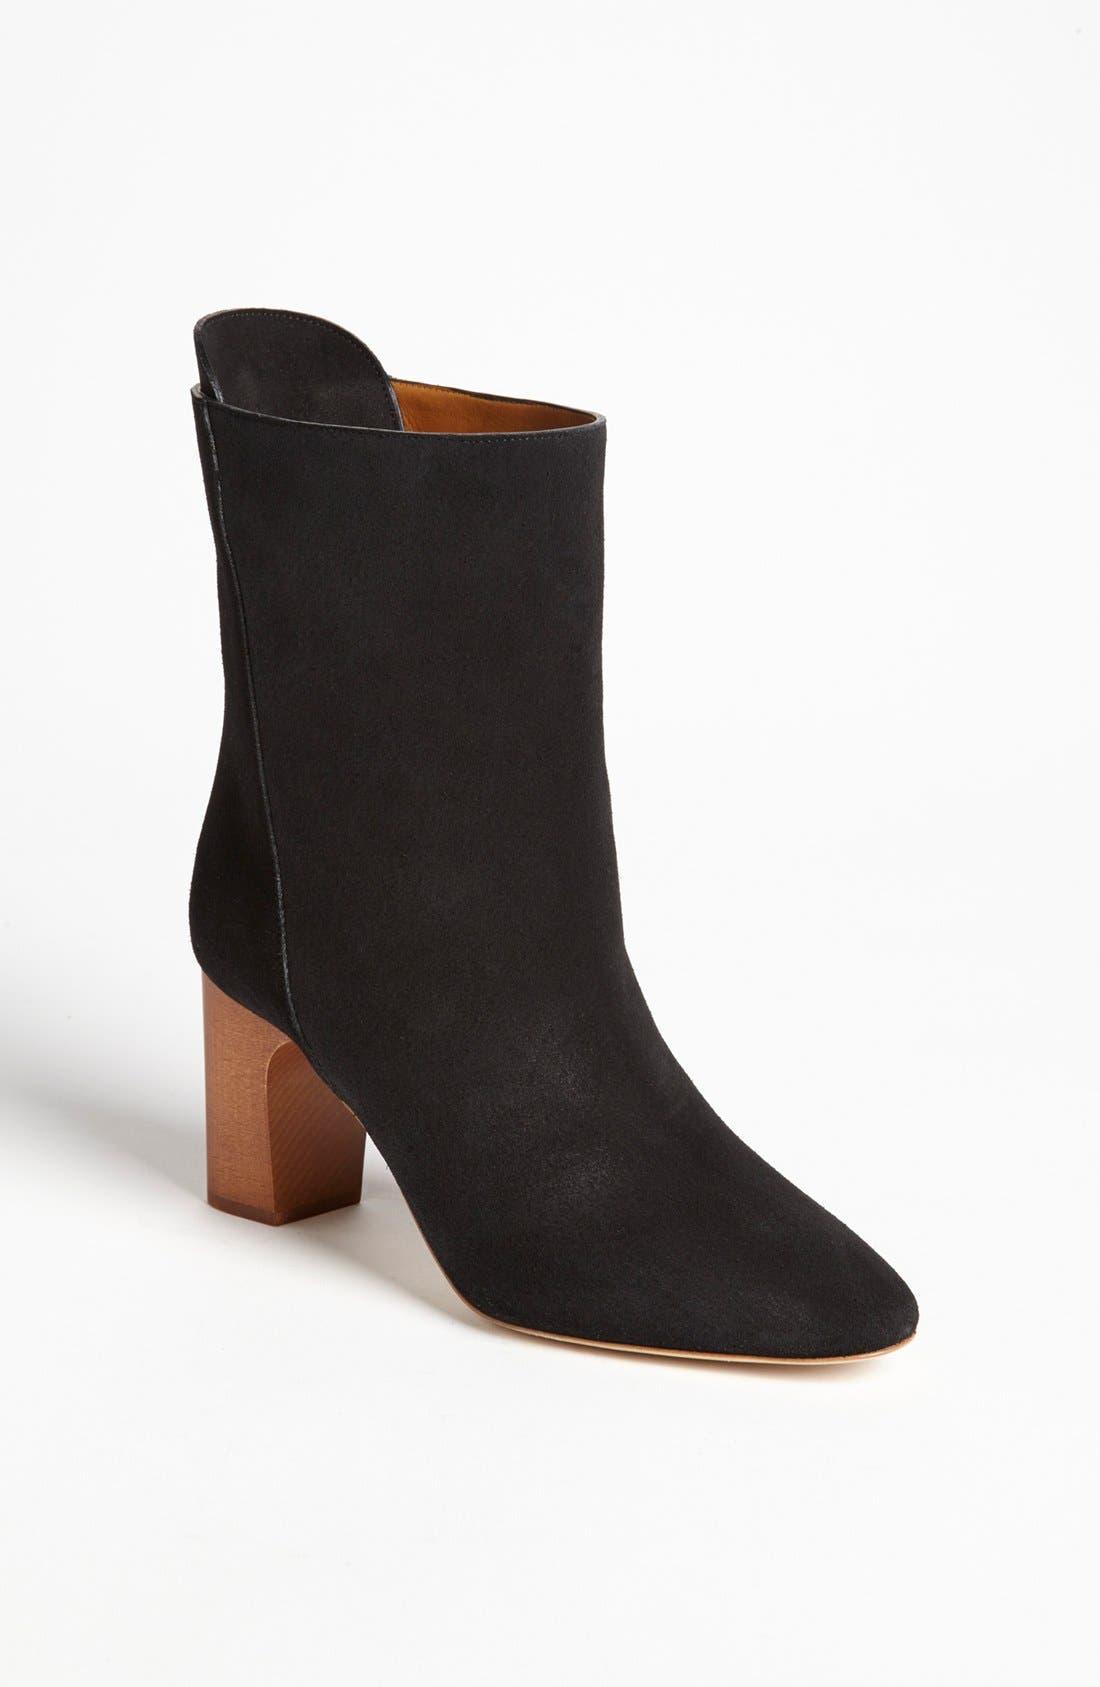 Main Image - Chloé 'Adelin' Mid Boot